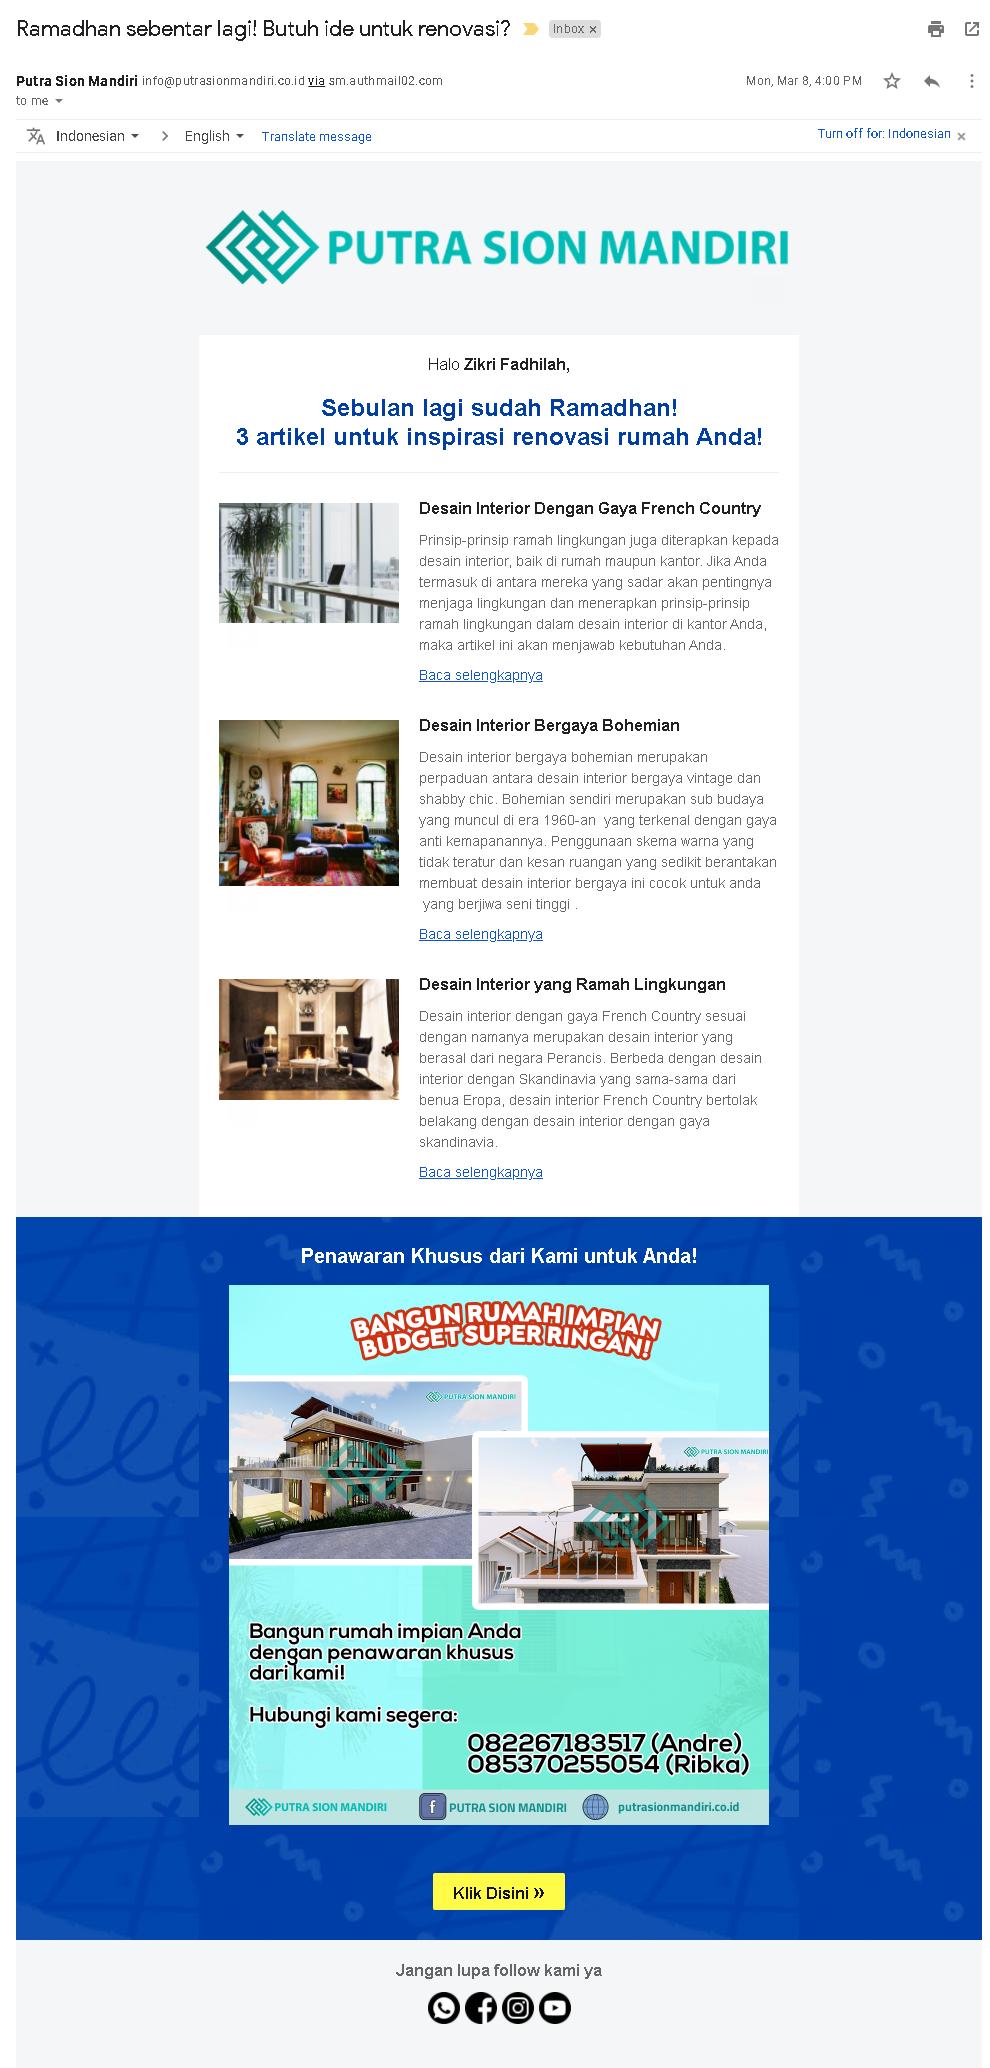 Email Marketing Putra Sion Mandiri